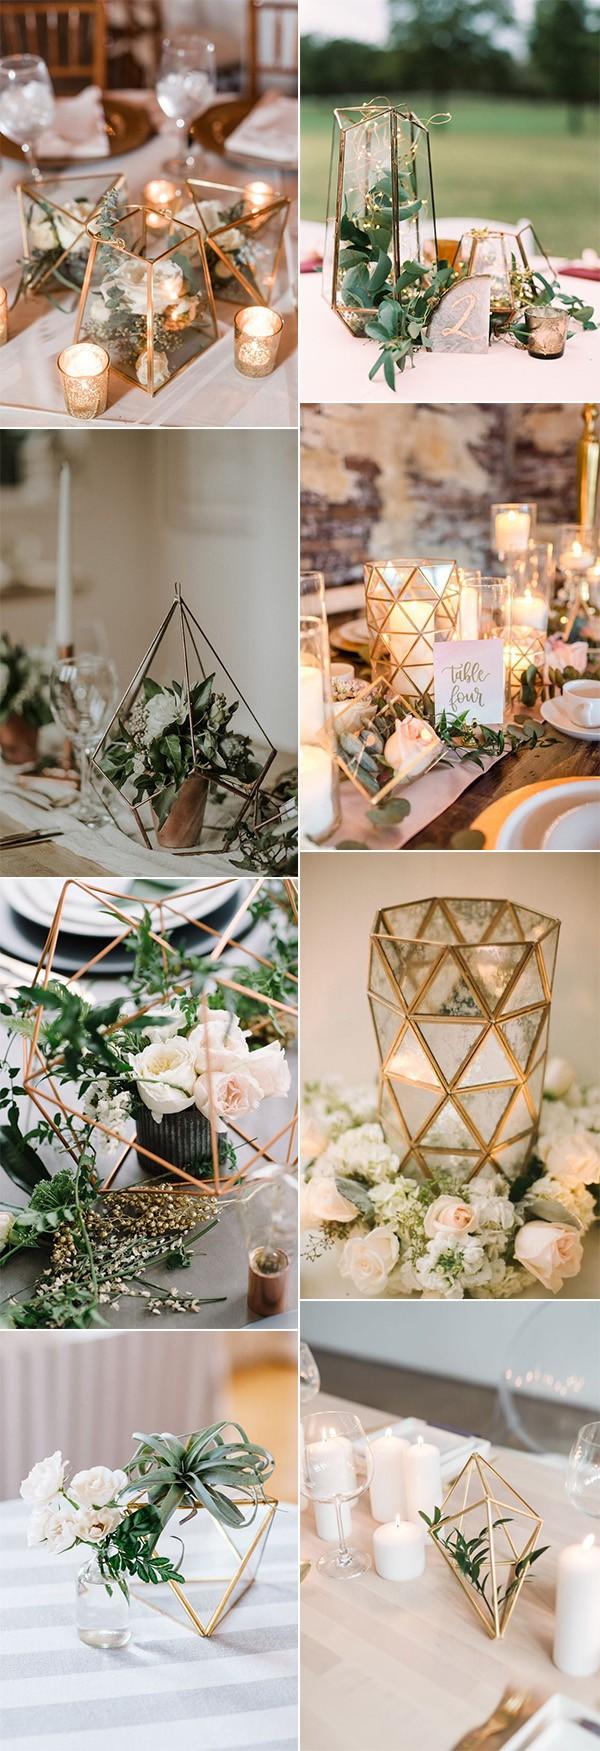 stunning geometric wedding centerpiece ideas for 2019 trends